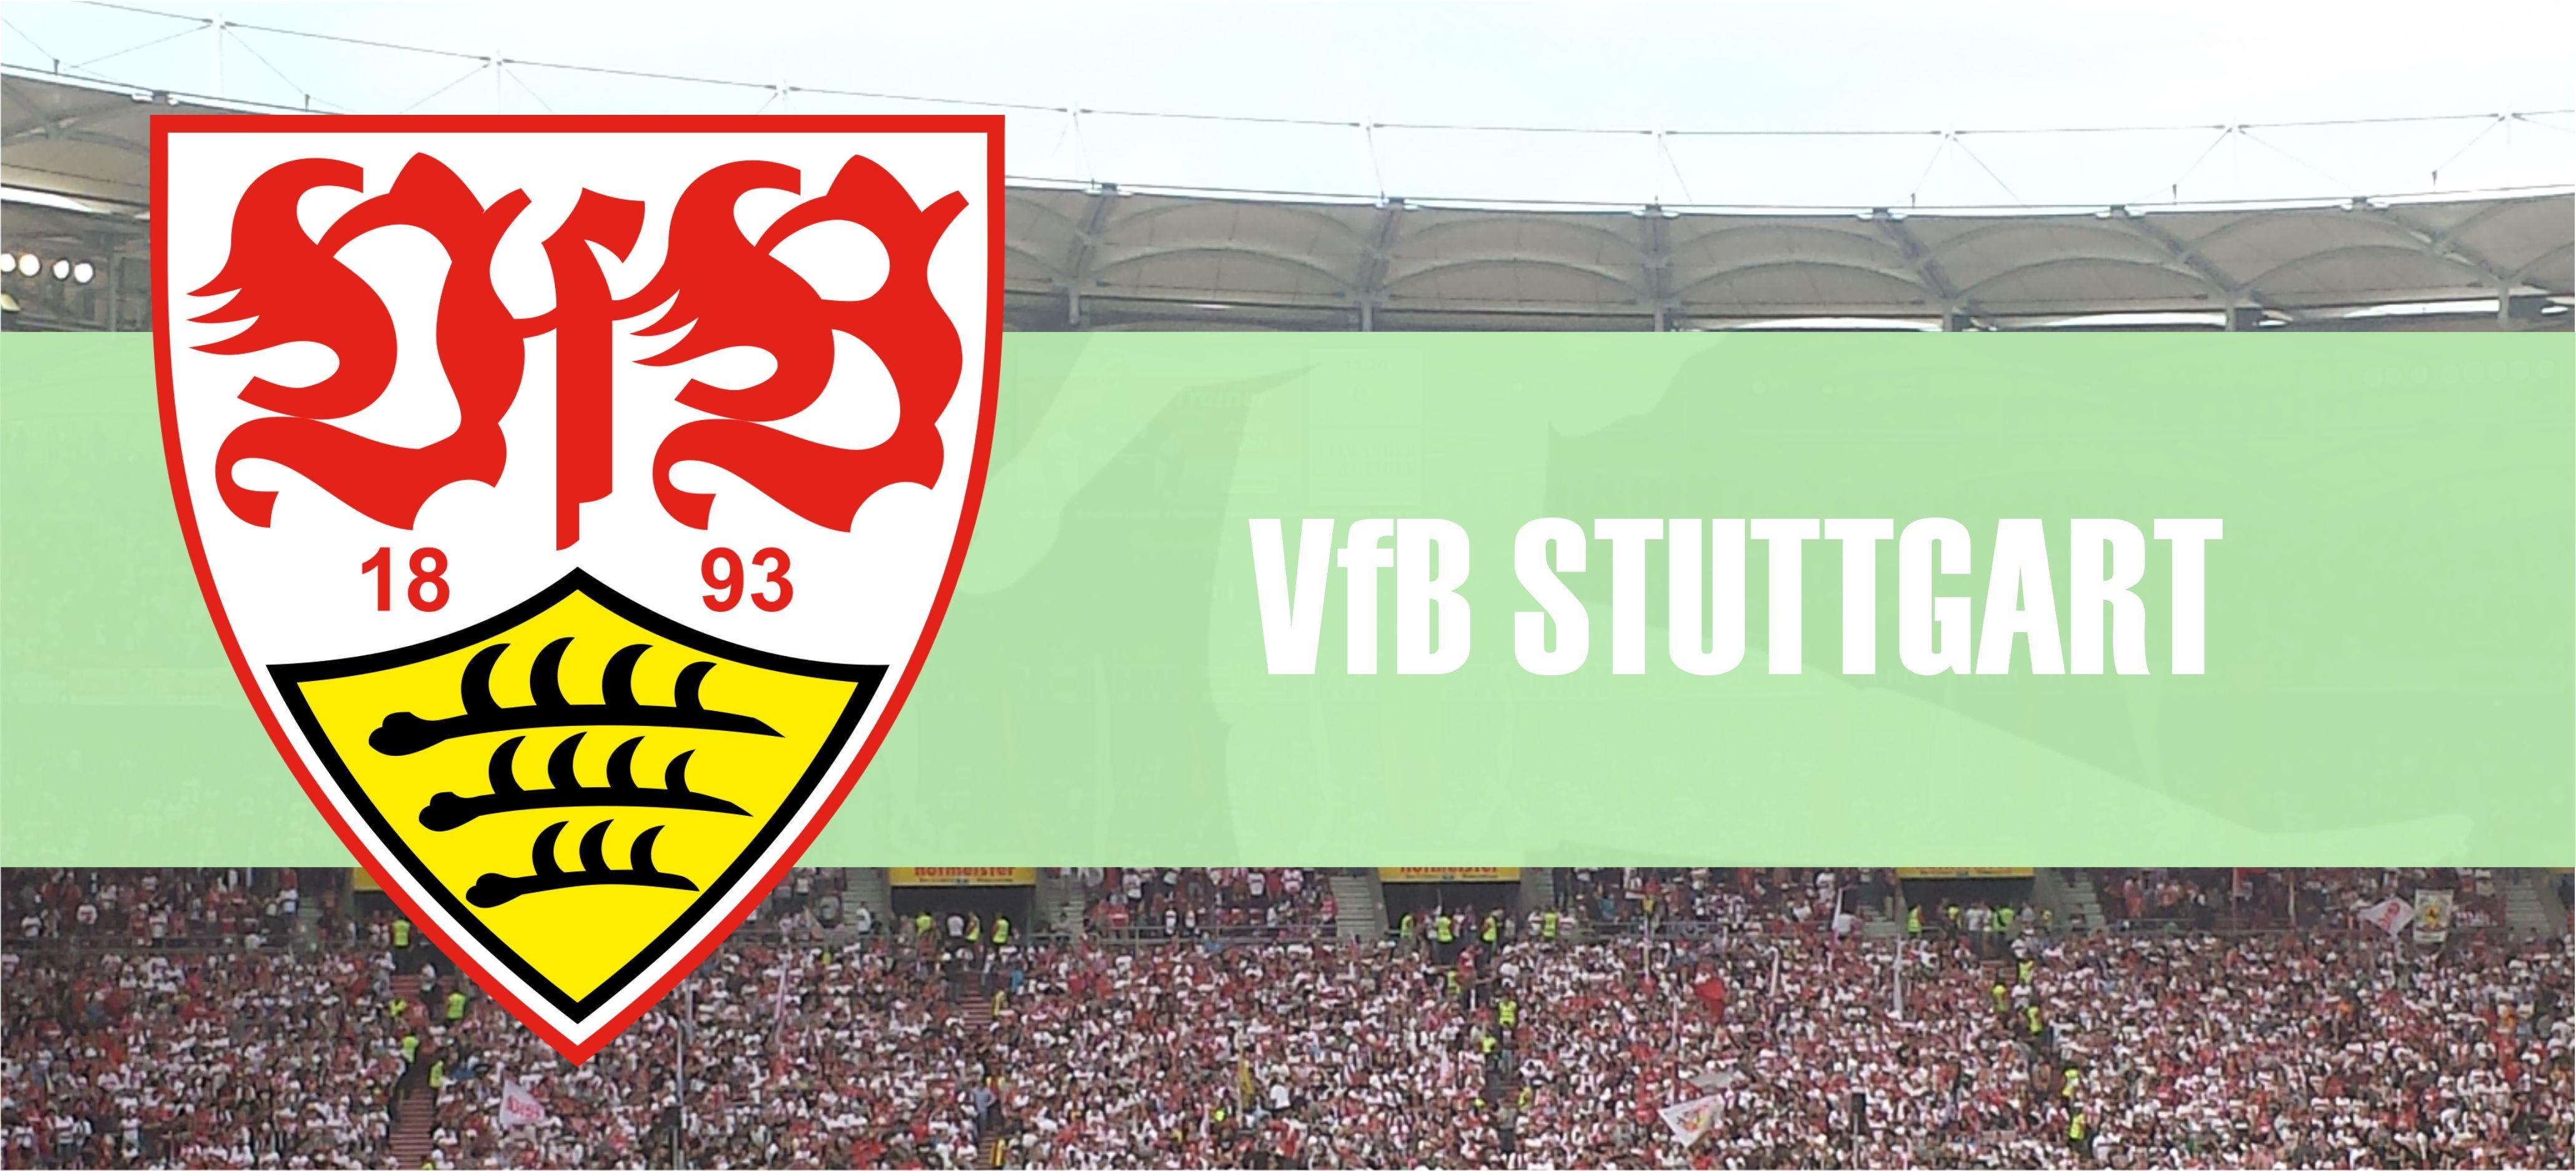 Skarb kibica Bundesligi: VfB Stuttgart